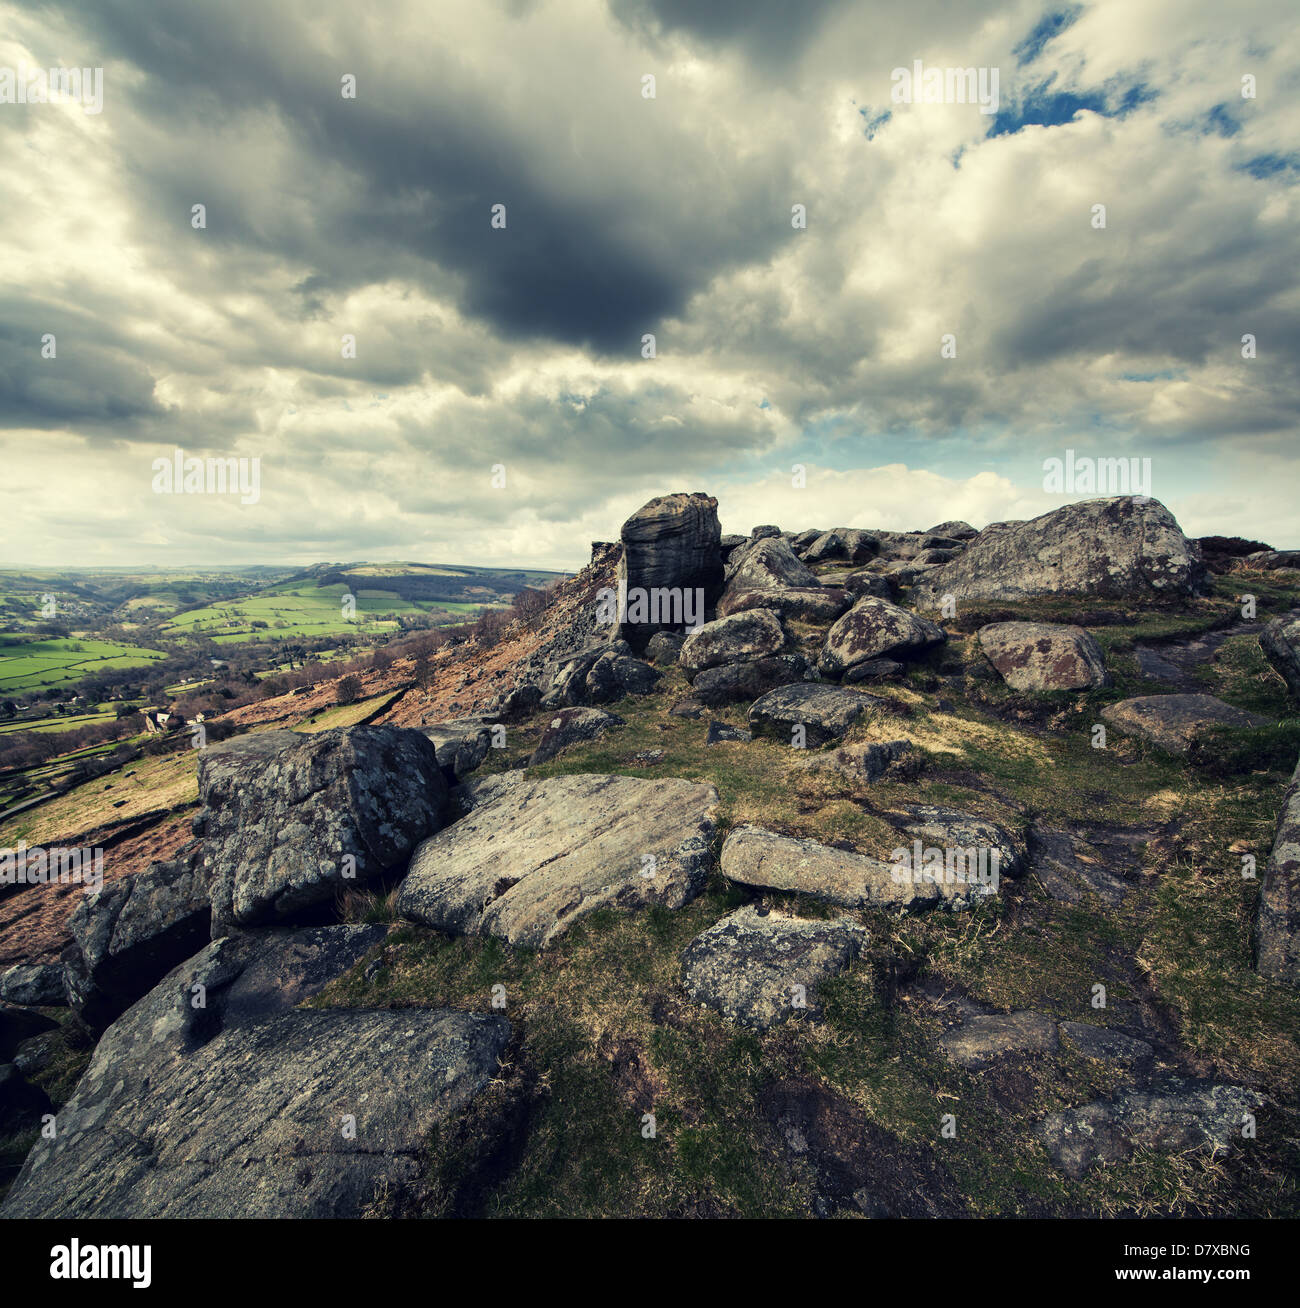 Curbar Edge, Derbyshire - Stock Image